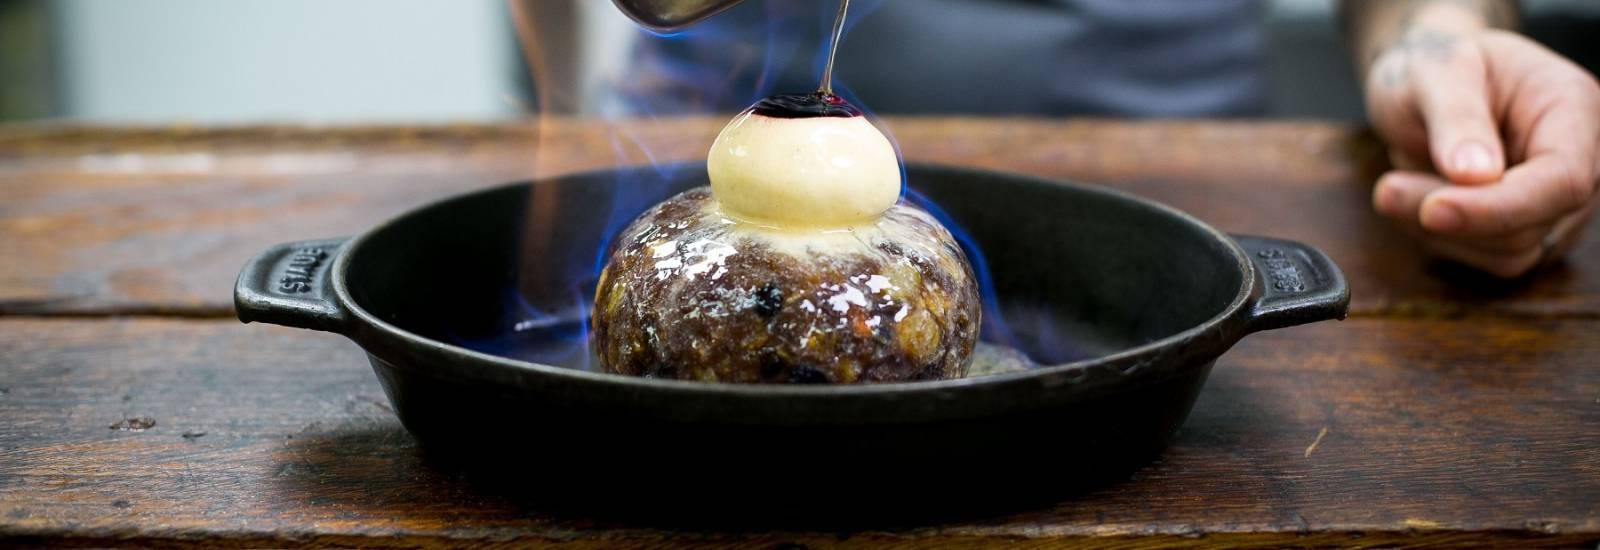 Christmas Food.Christmas Recipes Inspiration Gordon Ramsay Restaurants